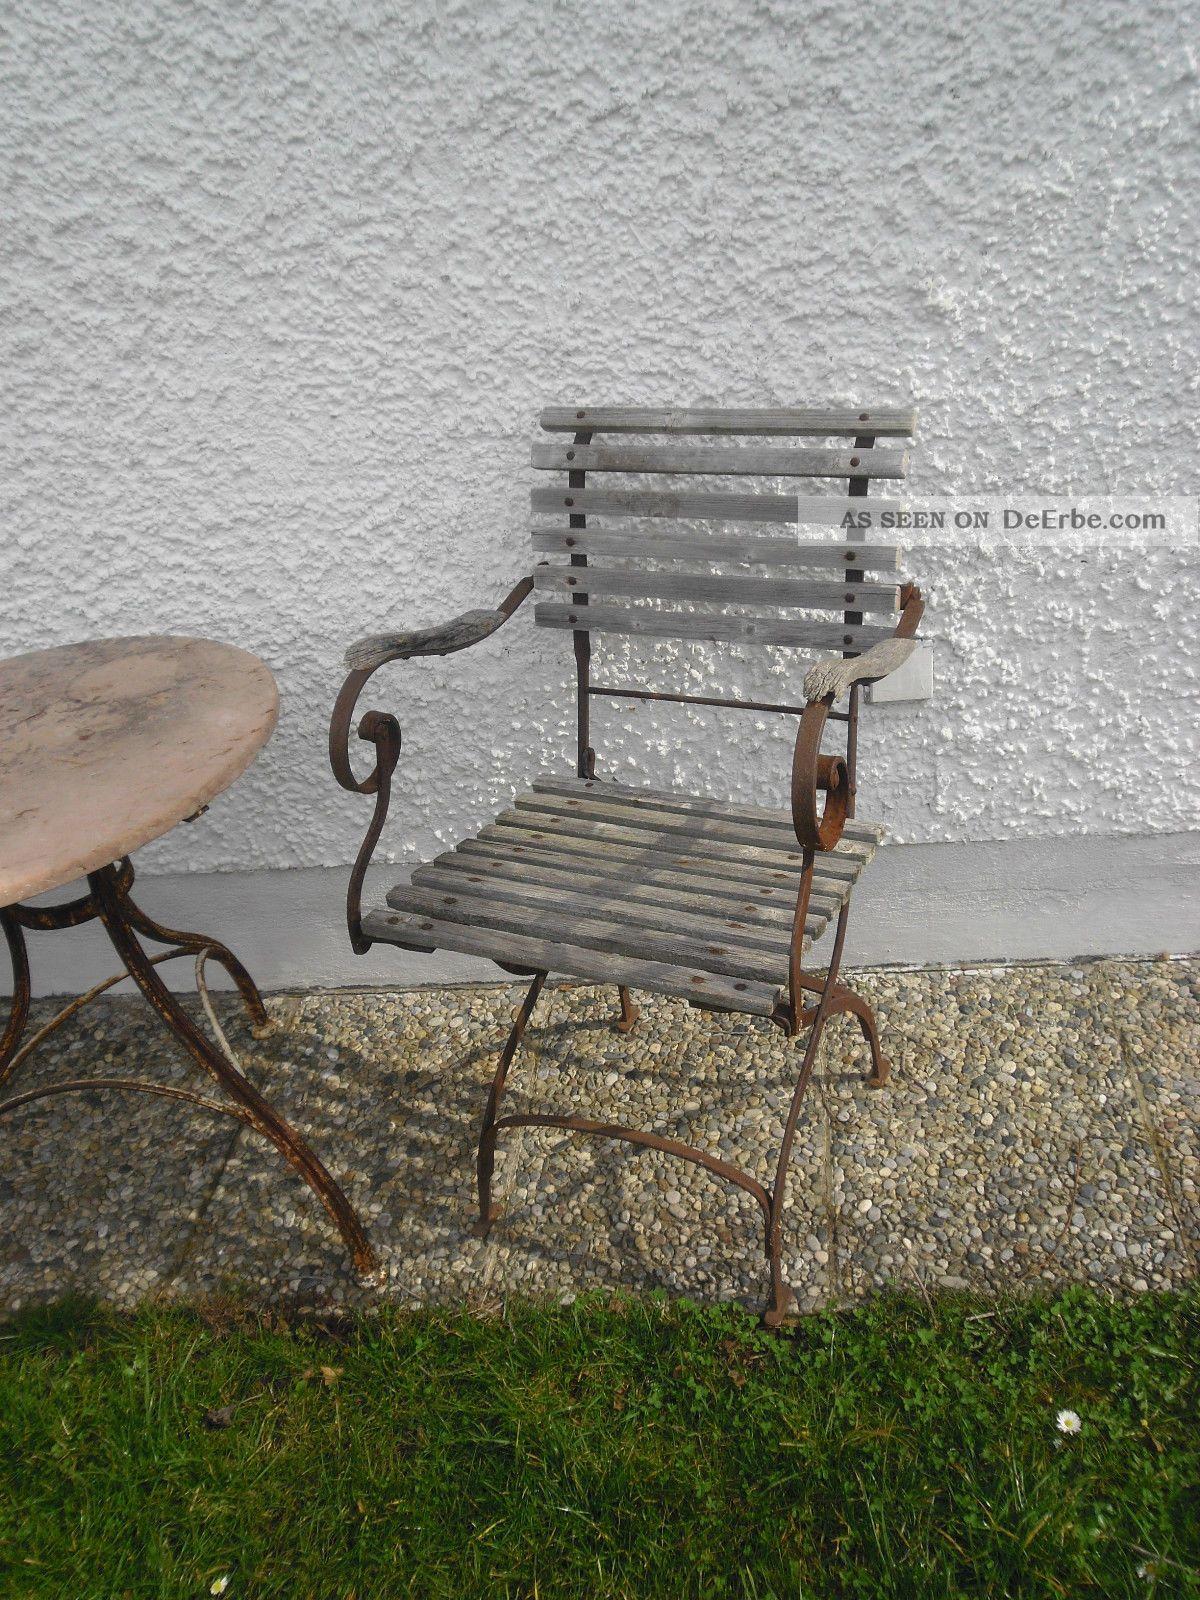 2 x alter gartenstuhl klappstuhl mit armlehne shabby chic. Black Bedroom Furniture Sets. Home Design Ideas